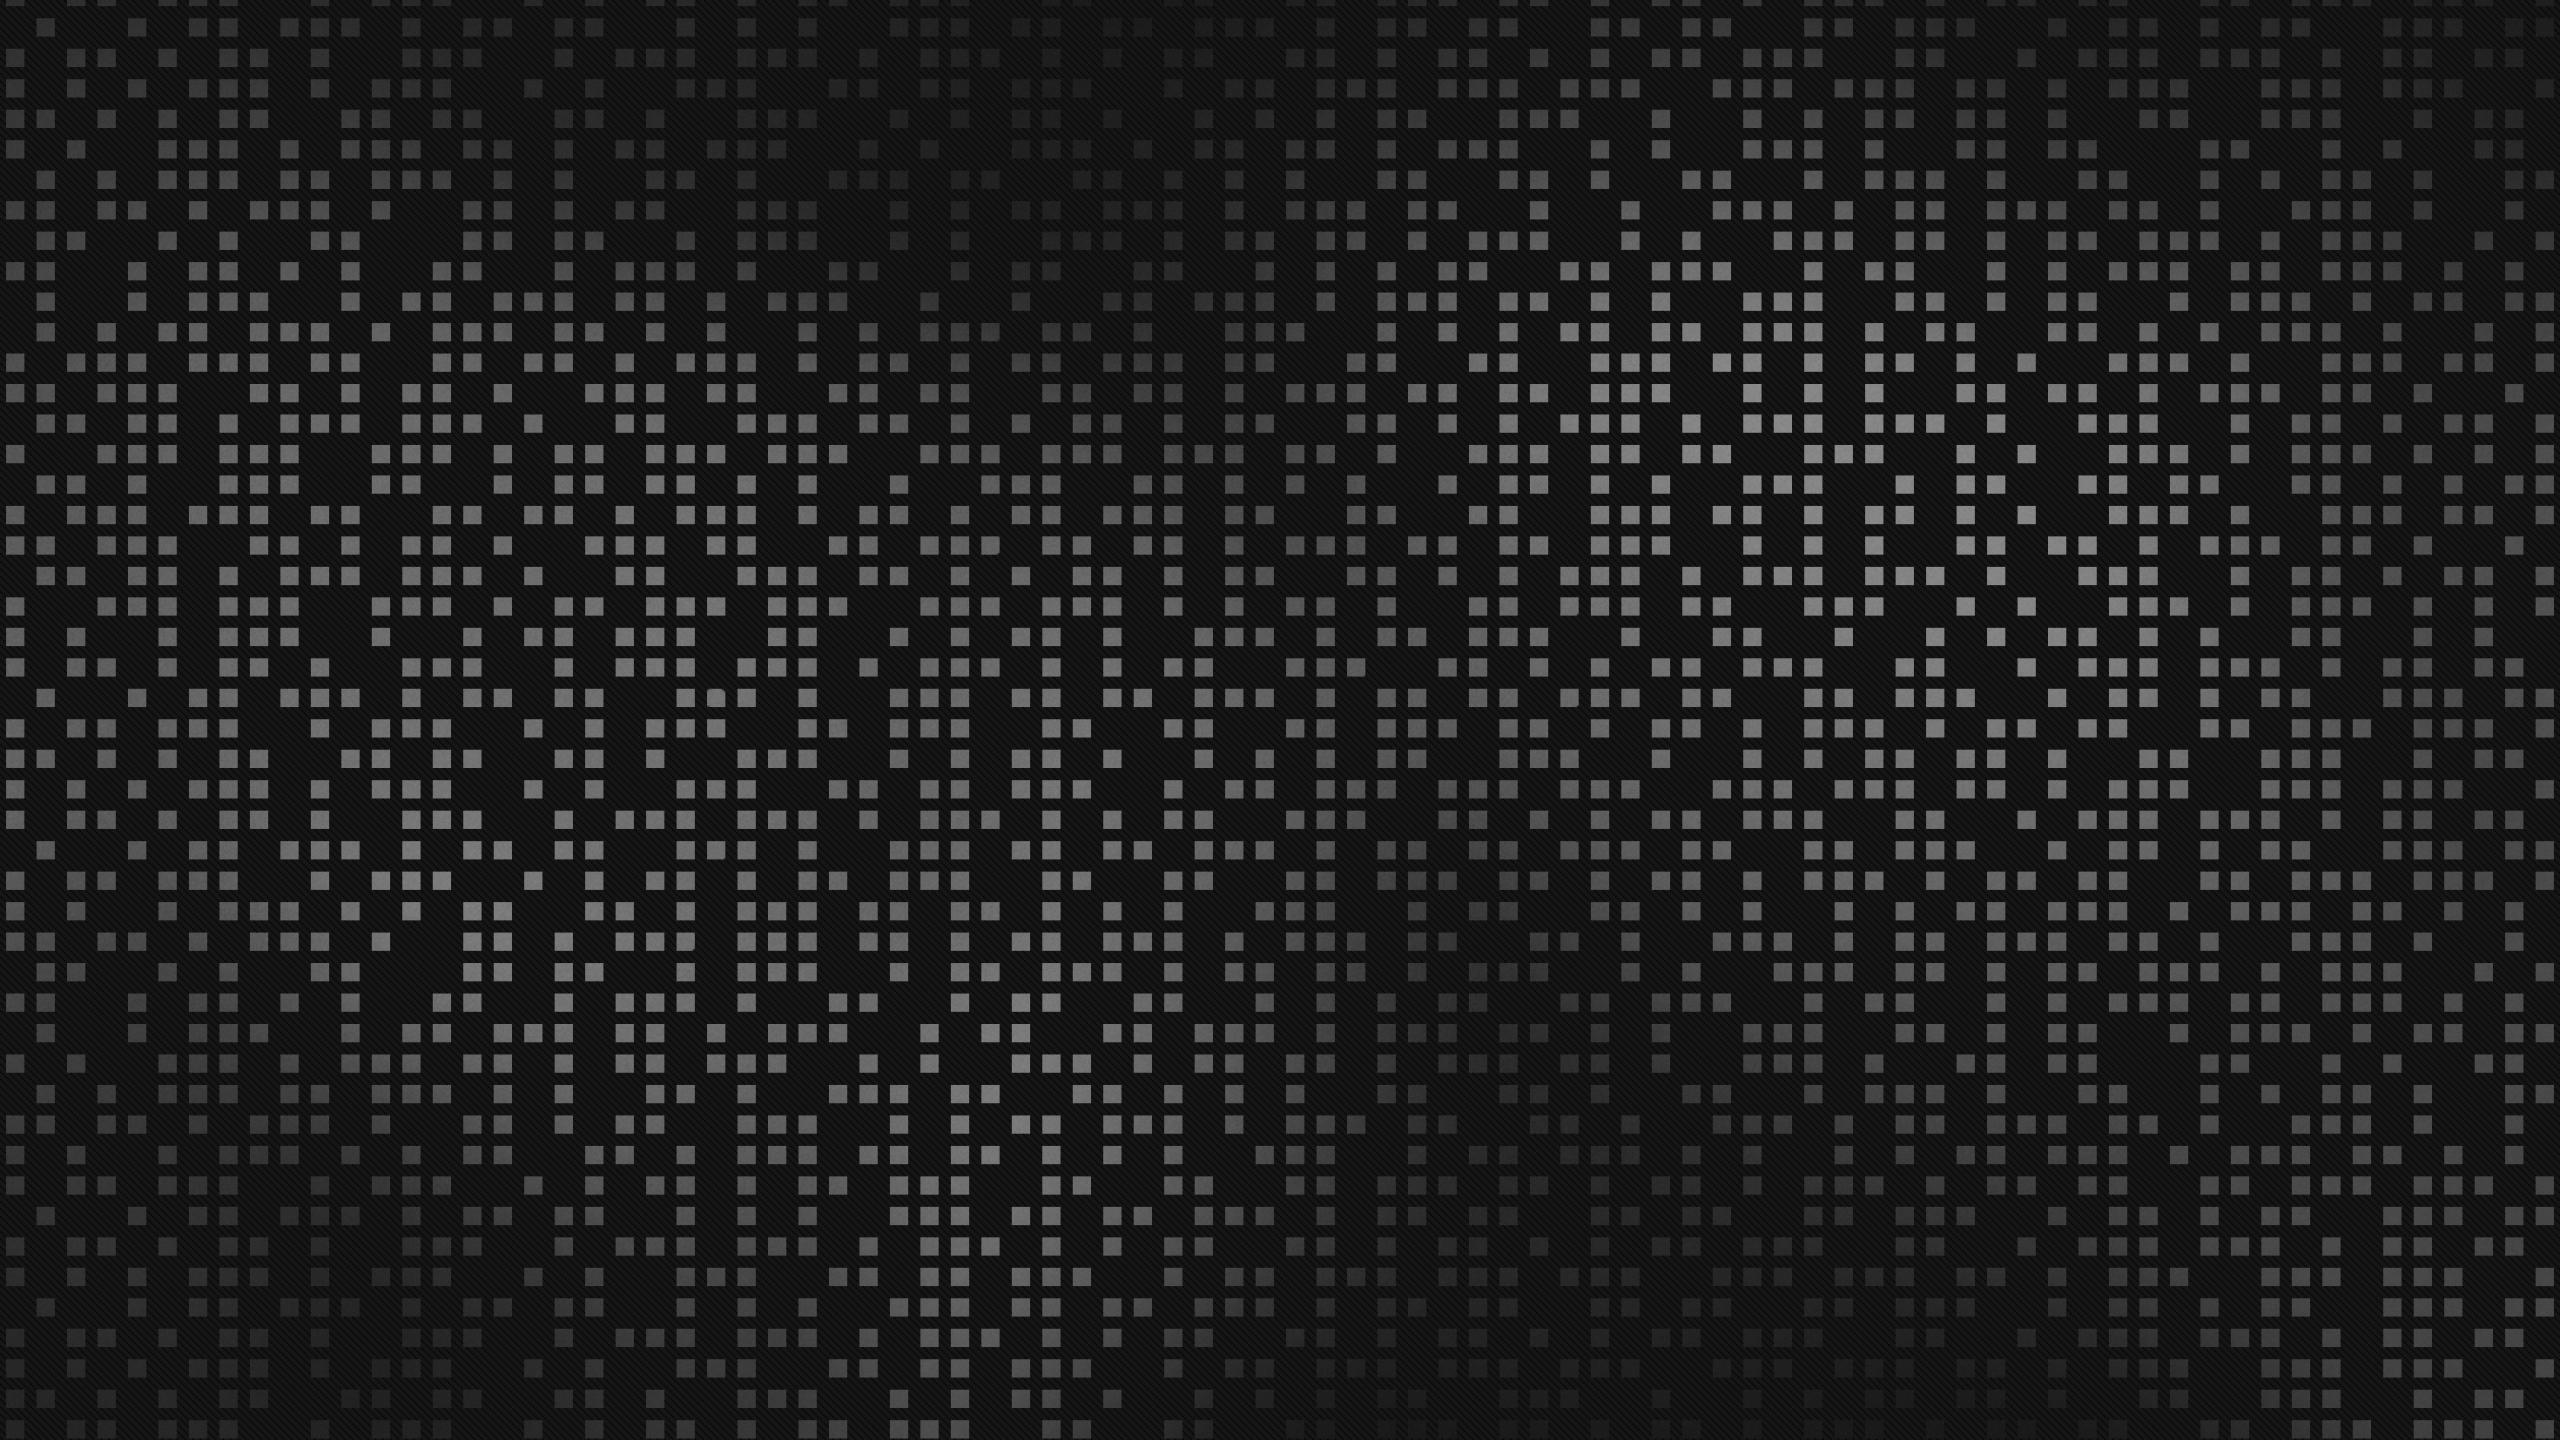 2560x1440 Wallpaper Phone Wallpapers 2760 Wallpaper Wallpaperyup 2560x1440